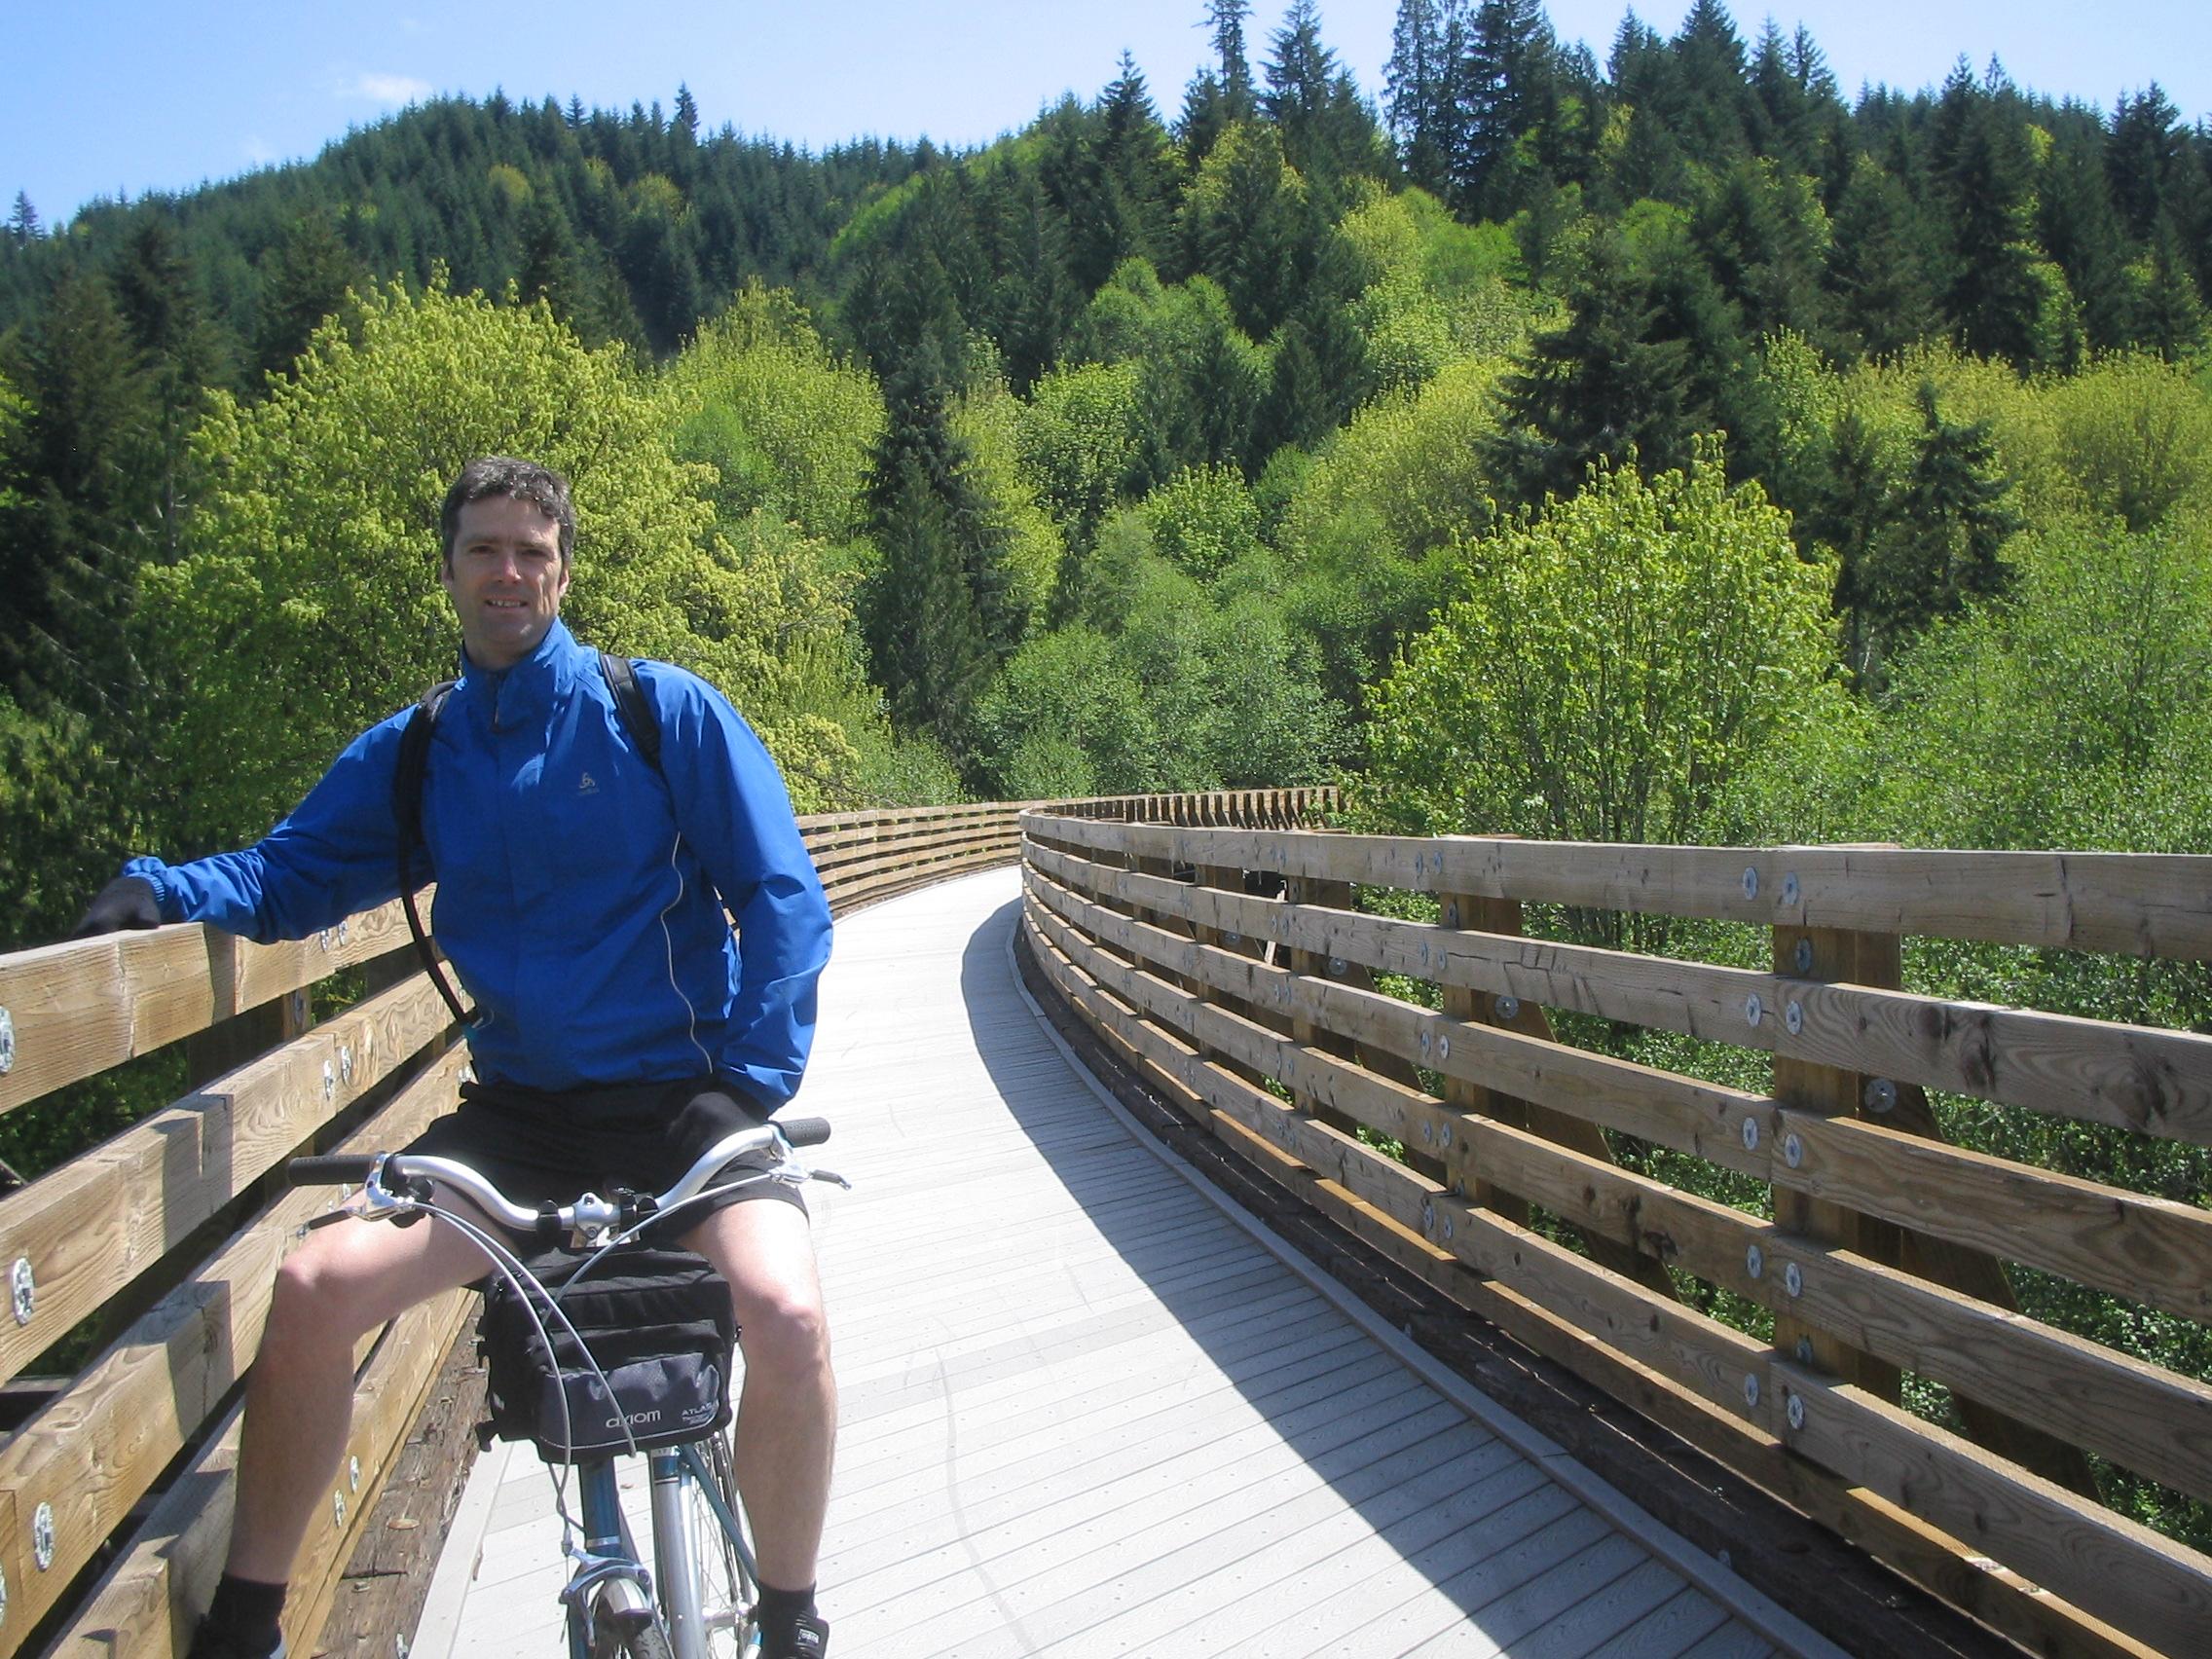 Pedal Bike Tours Oregon